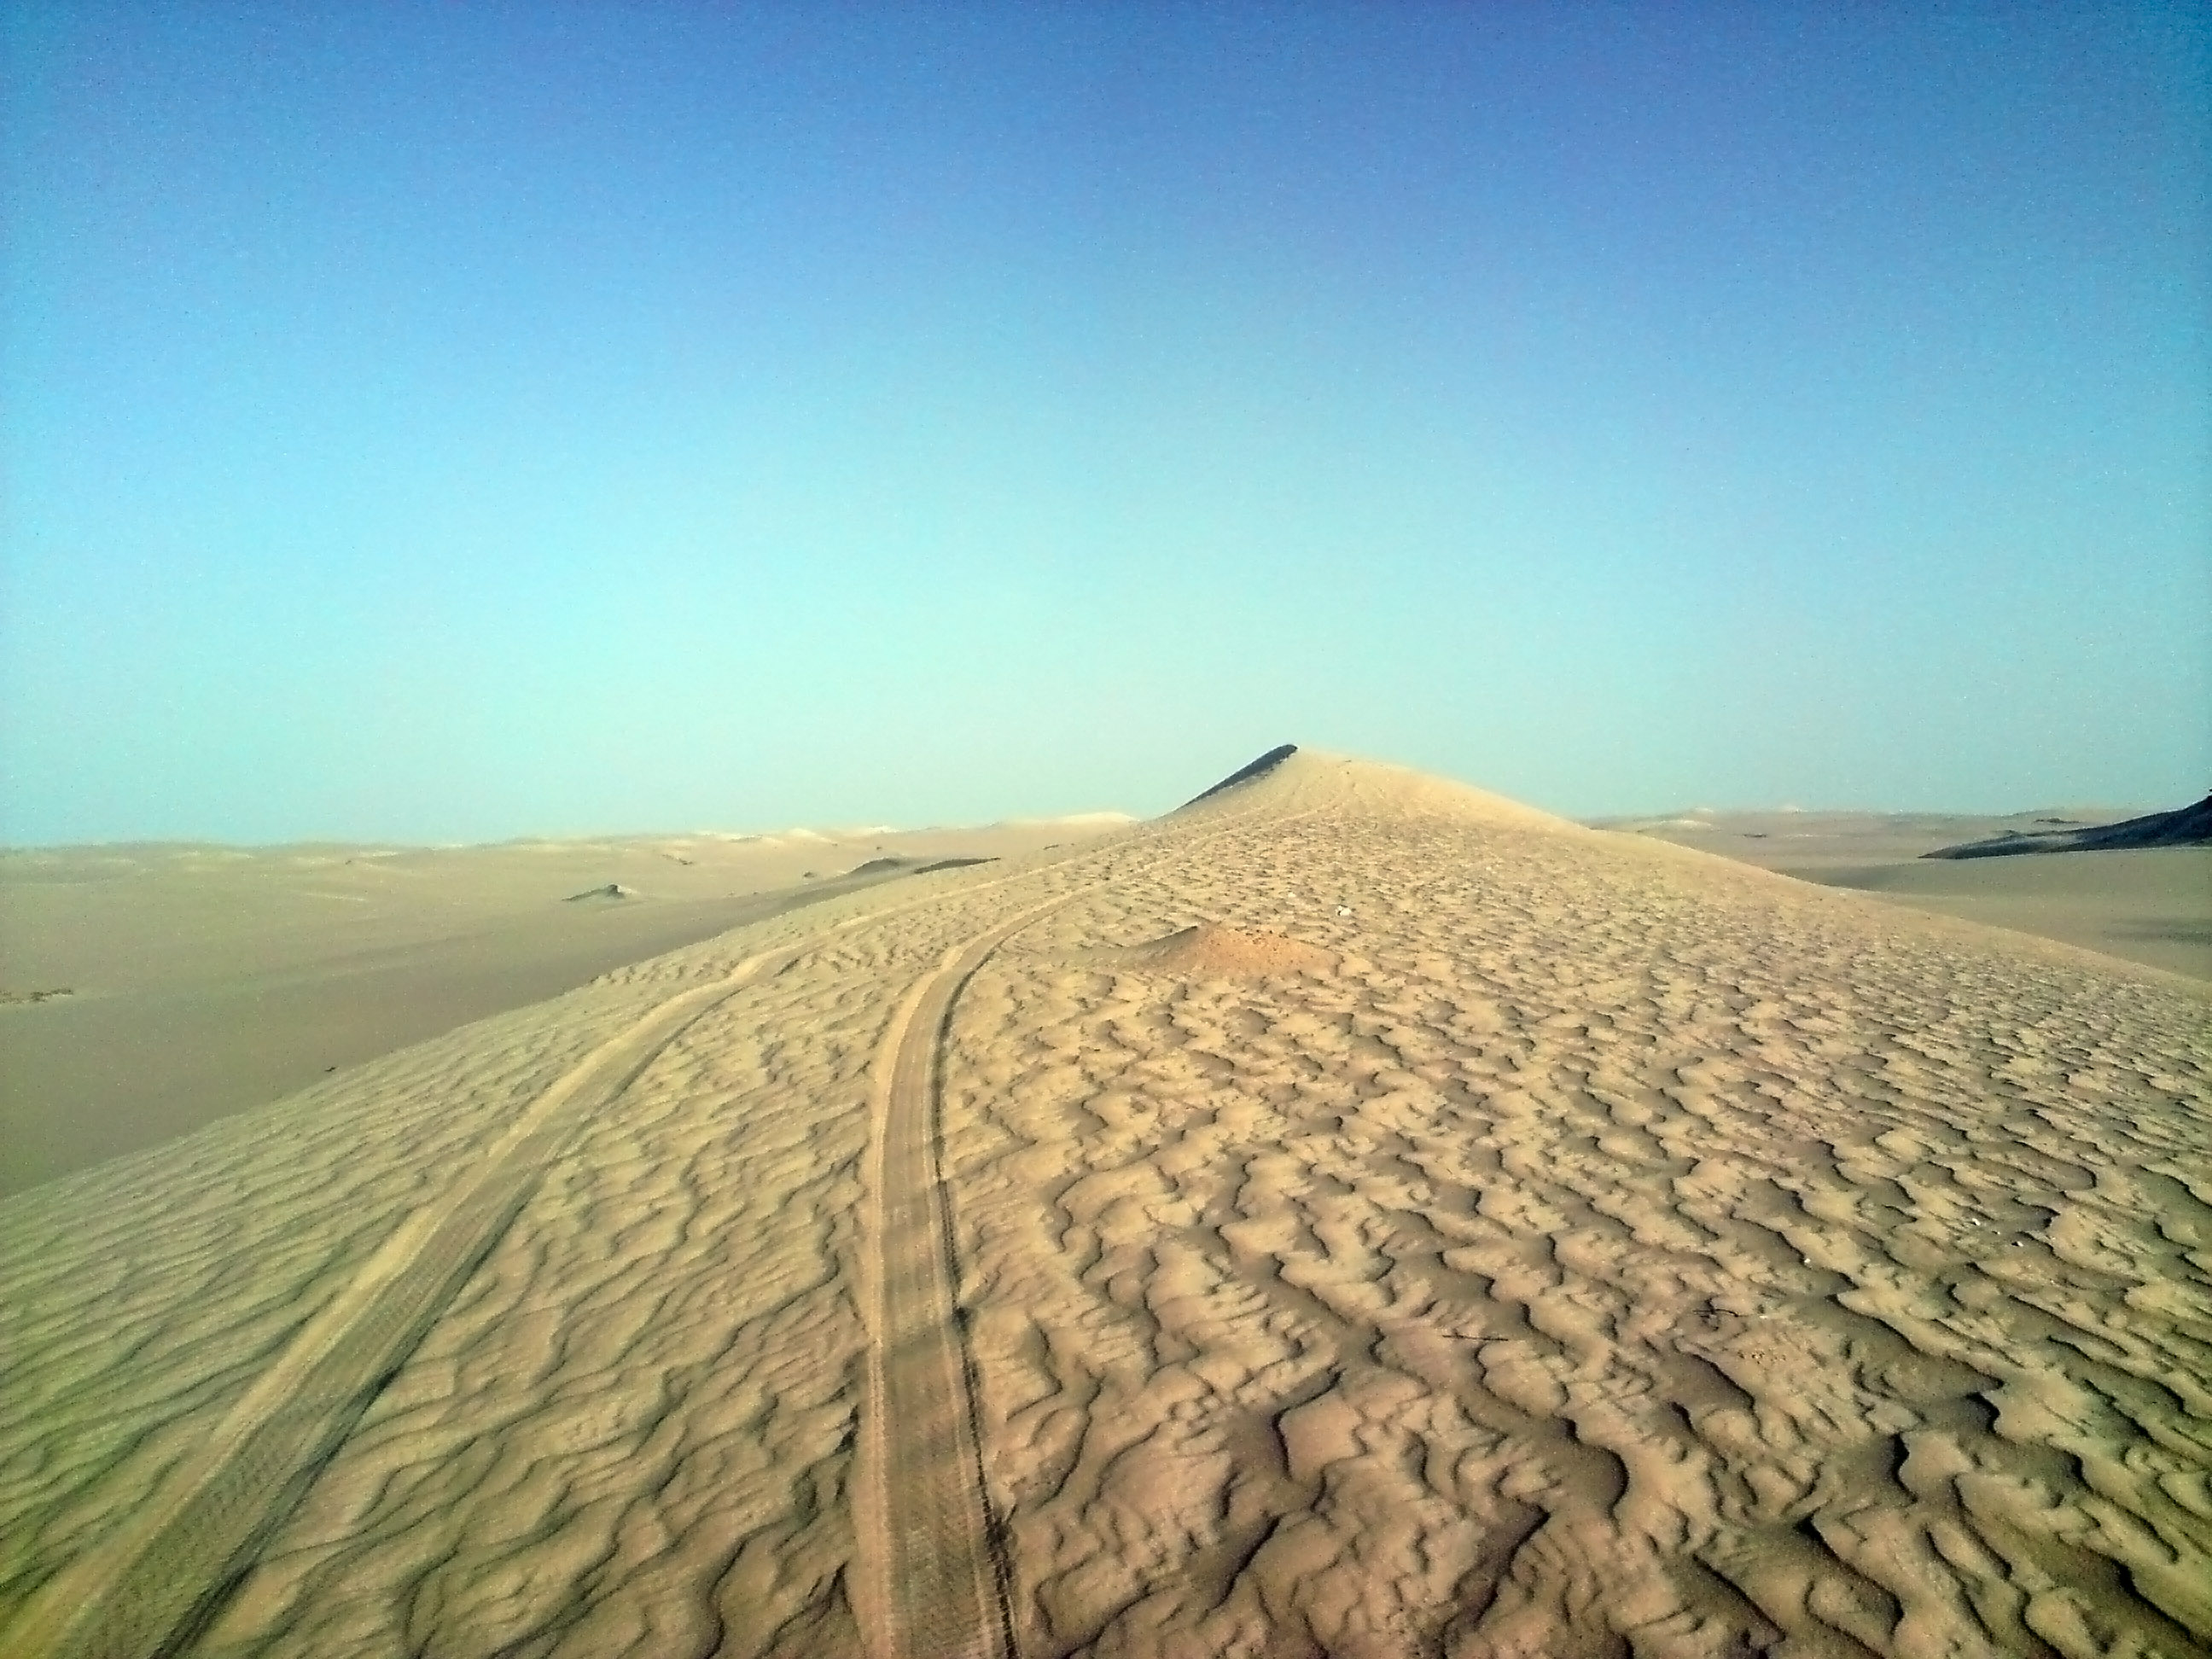 Siwa desert